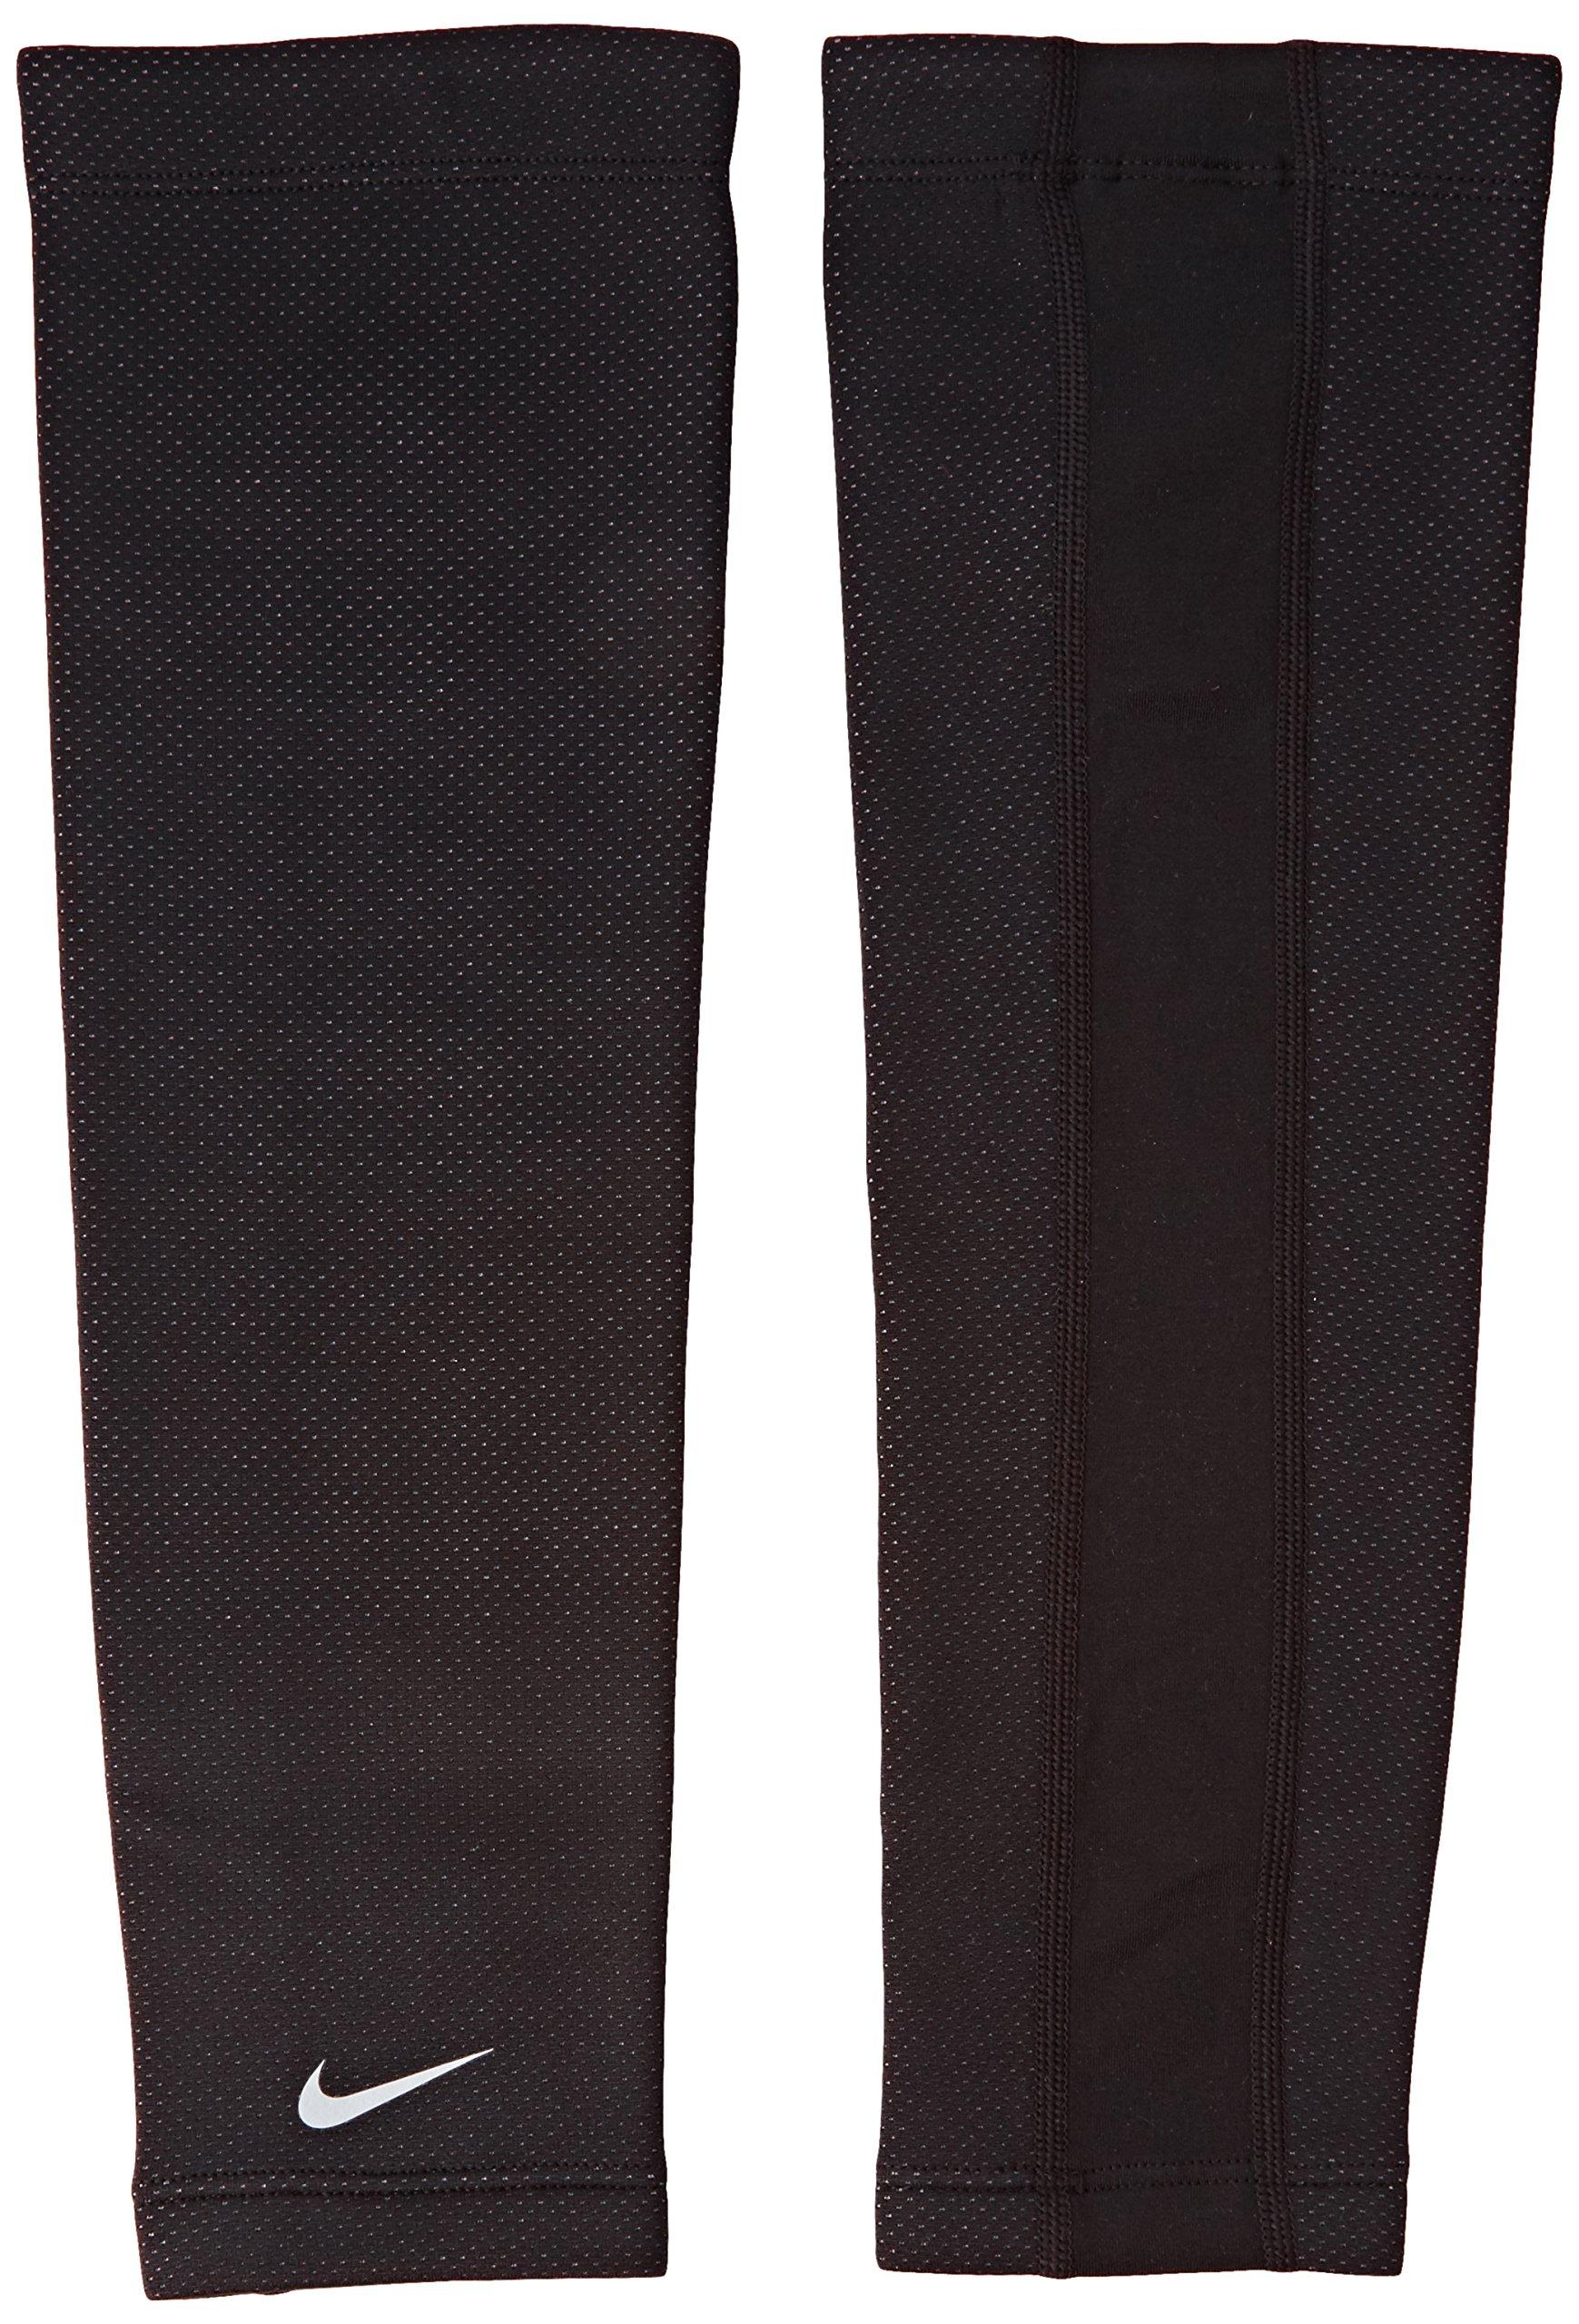 Nike Golf Hypervis Therma Sleeves (Black, Small/Medium)